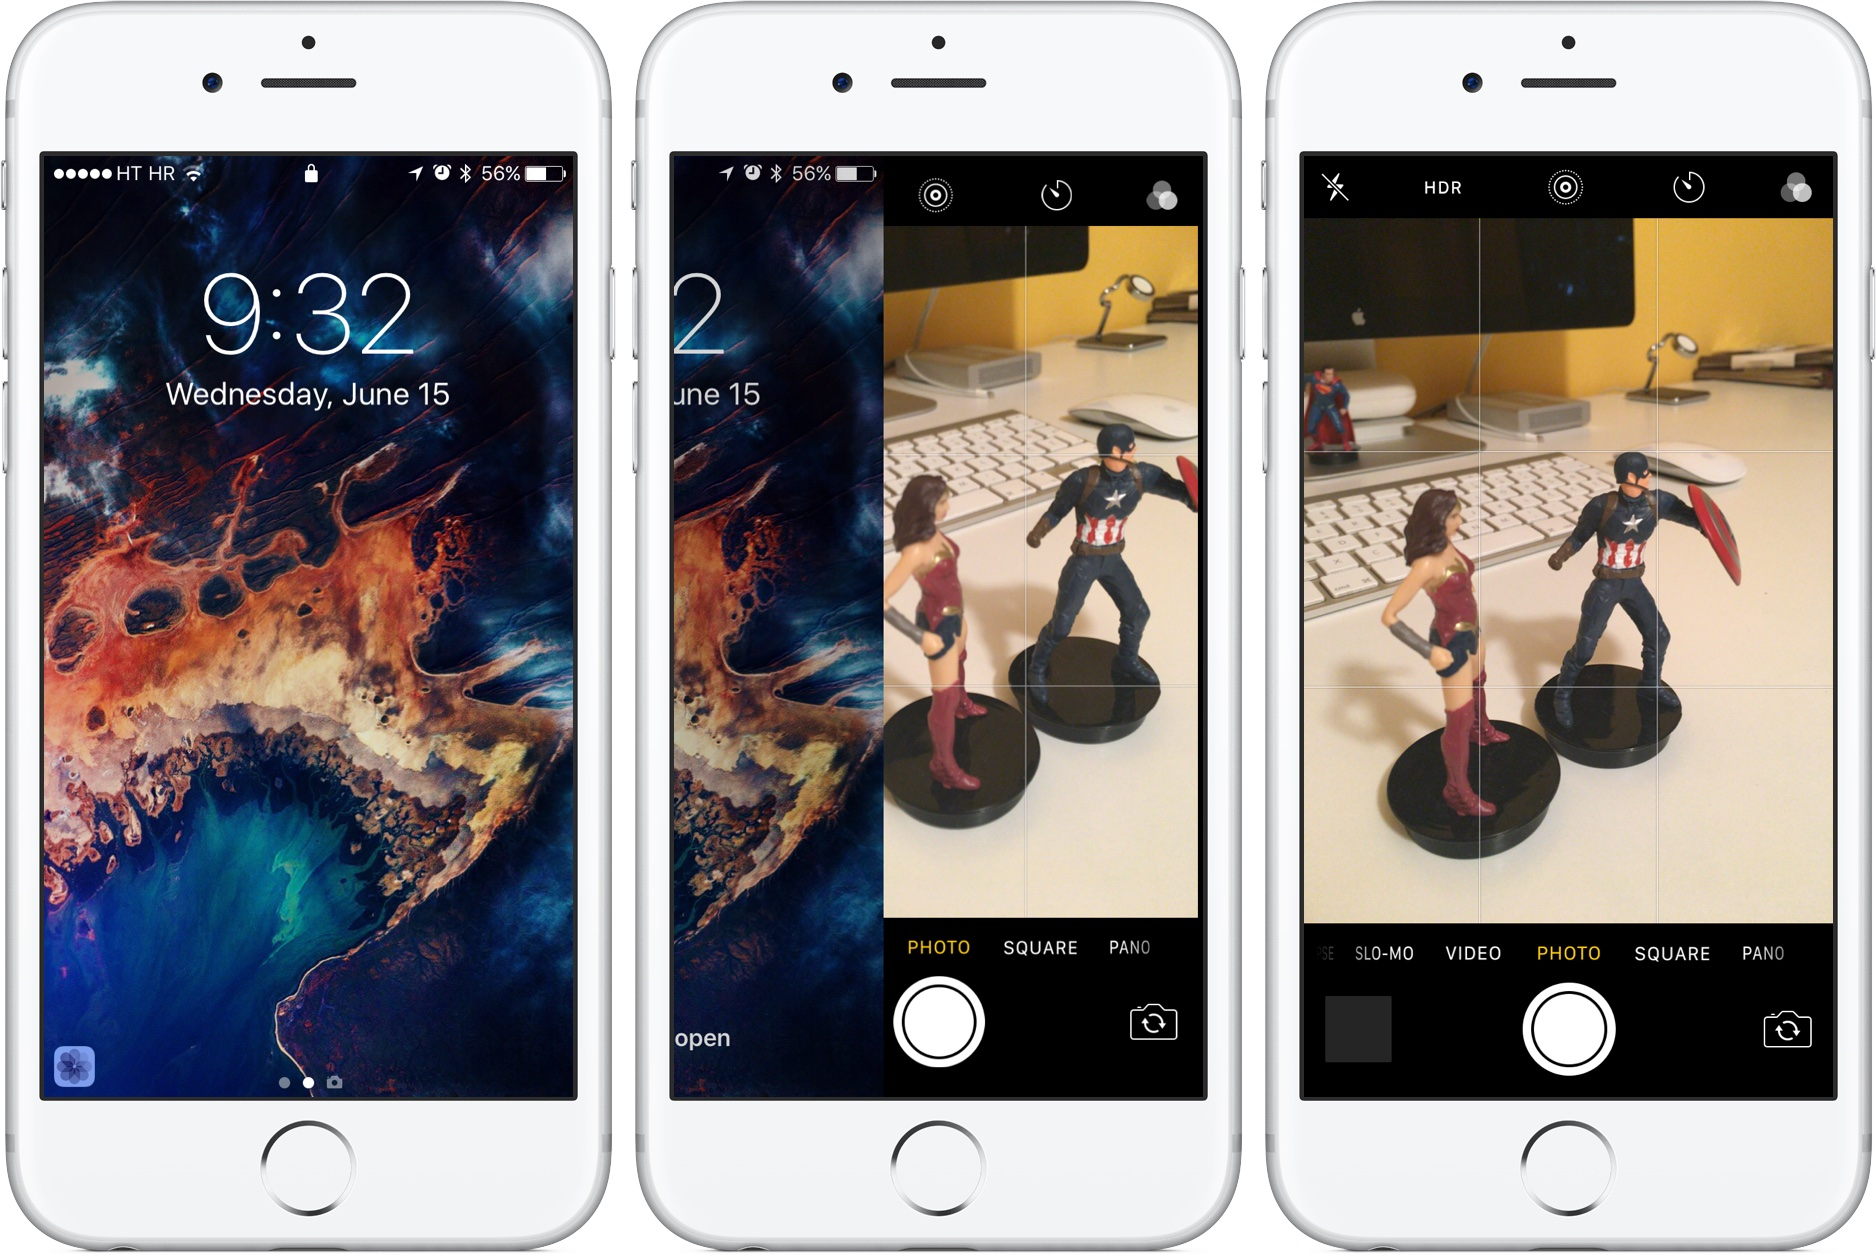 immagini schermata blocco iphone